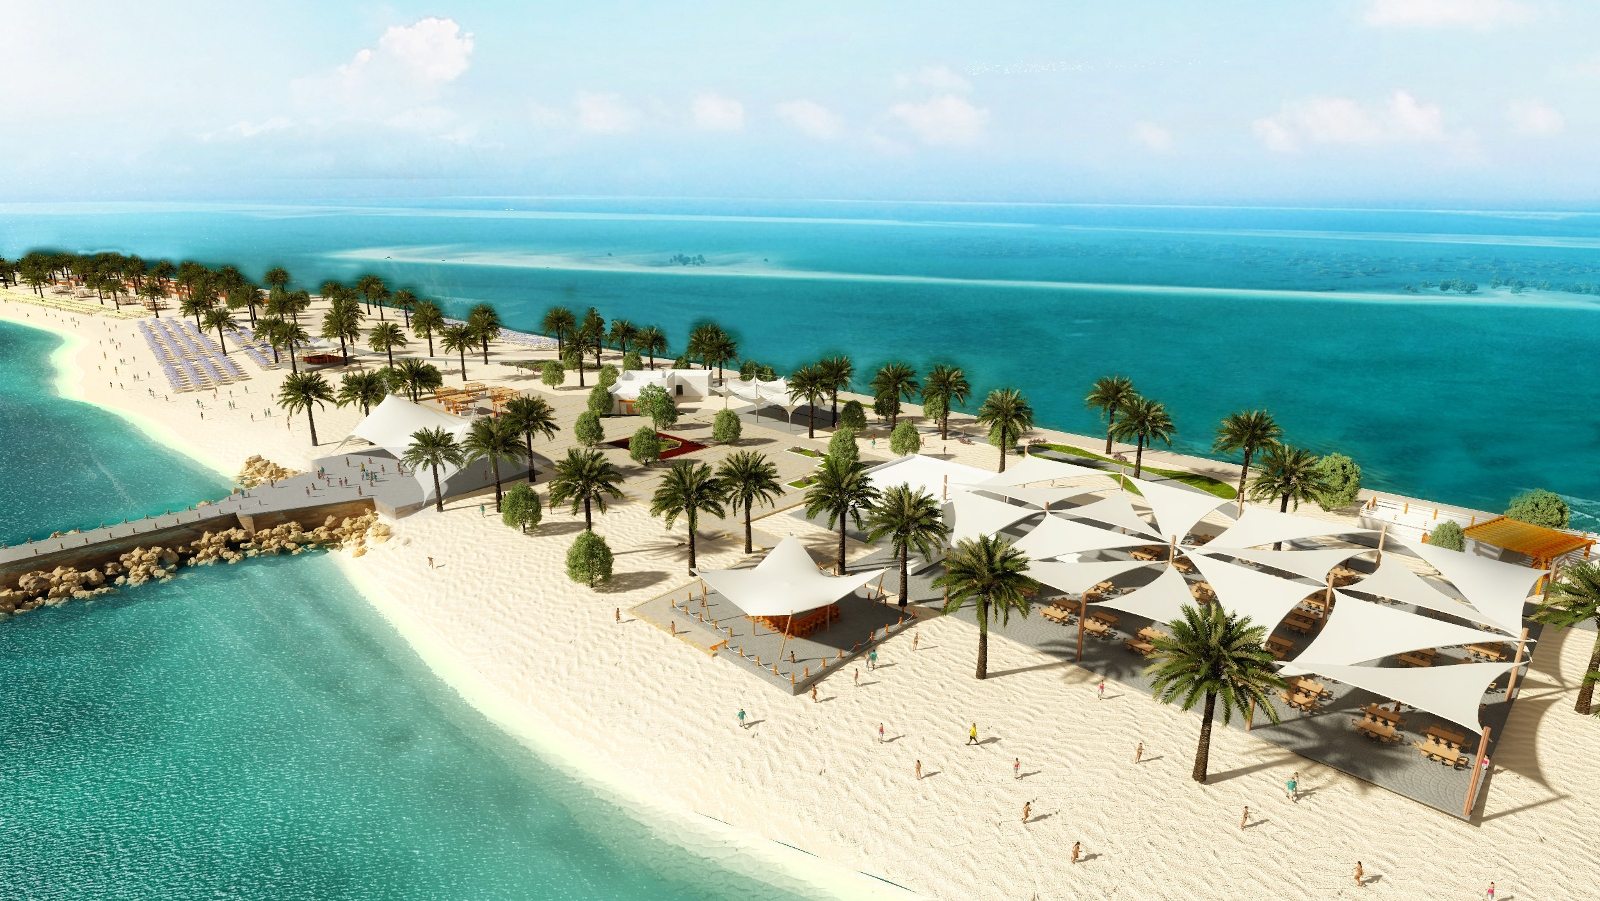 Sir Bani Yas Beach Island in Abu Dhabi to open in Dec this year